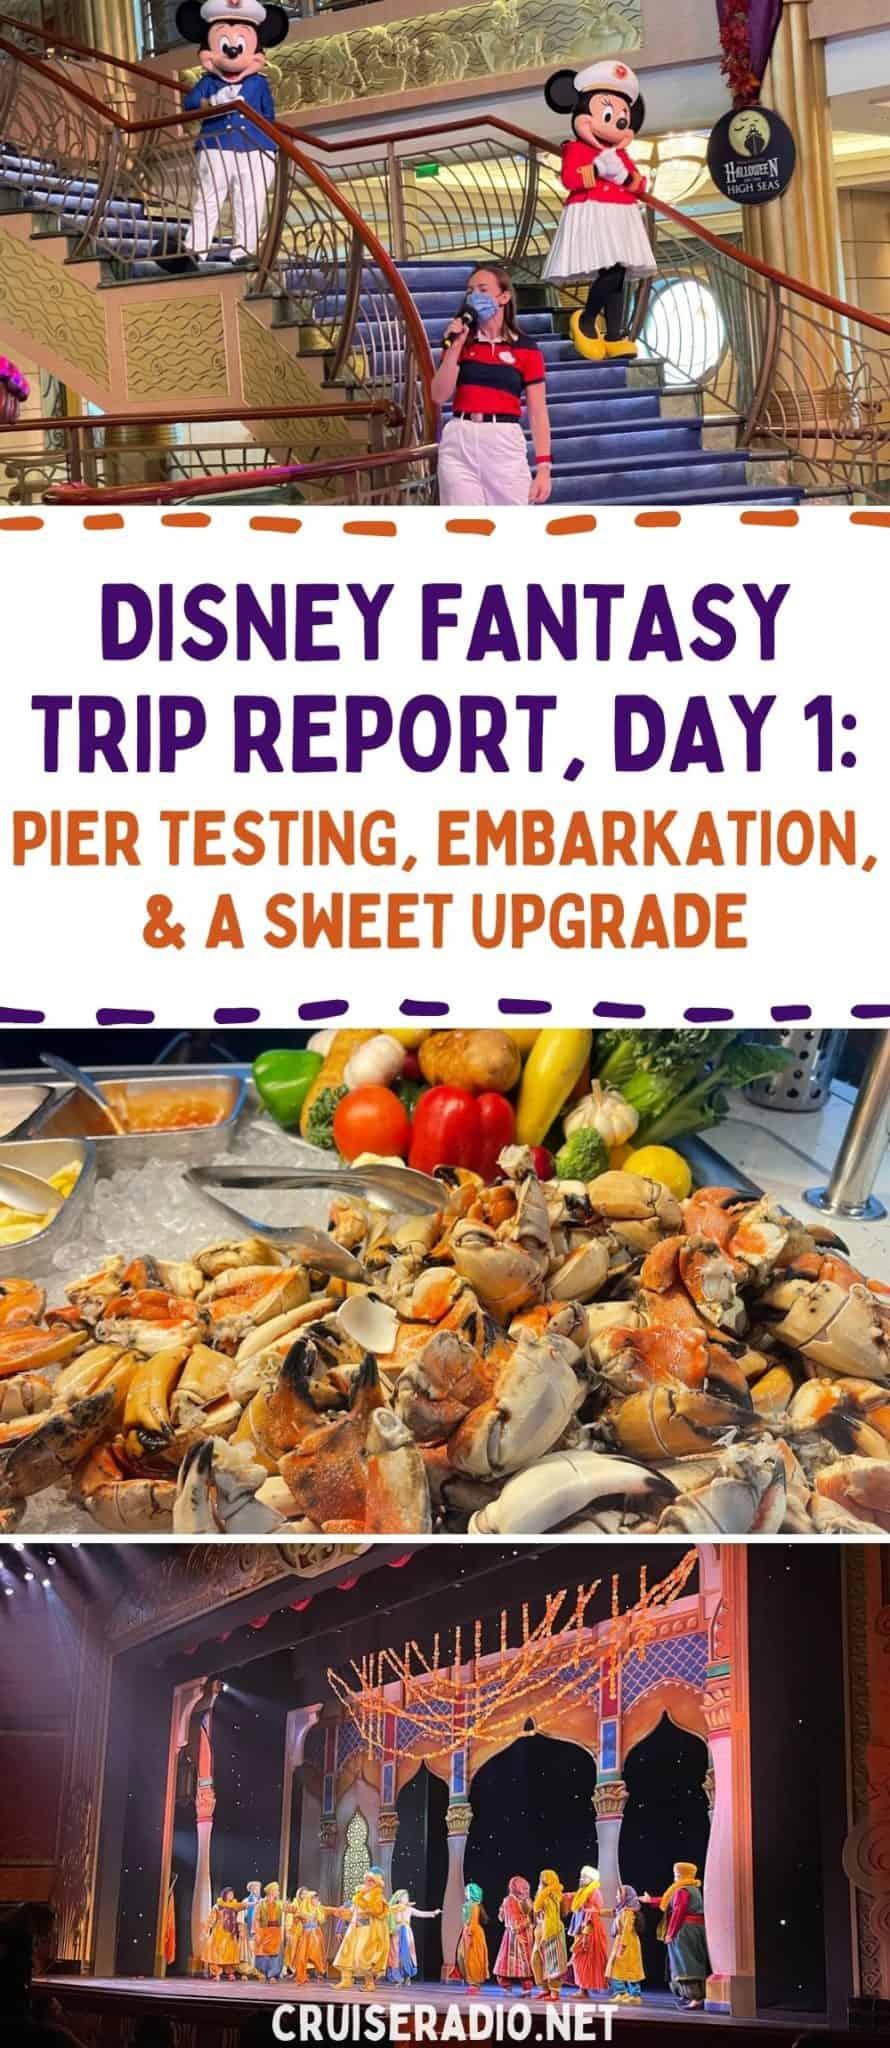 disney fantasy trip report, day 1